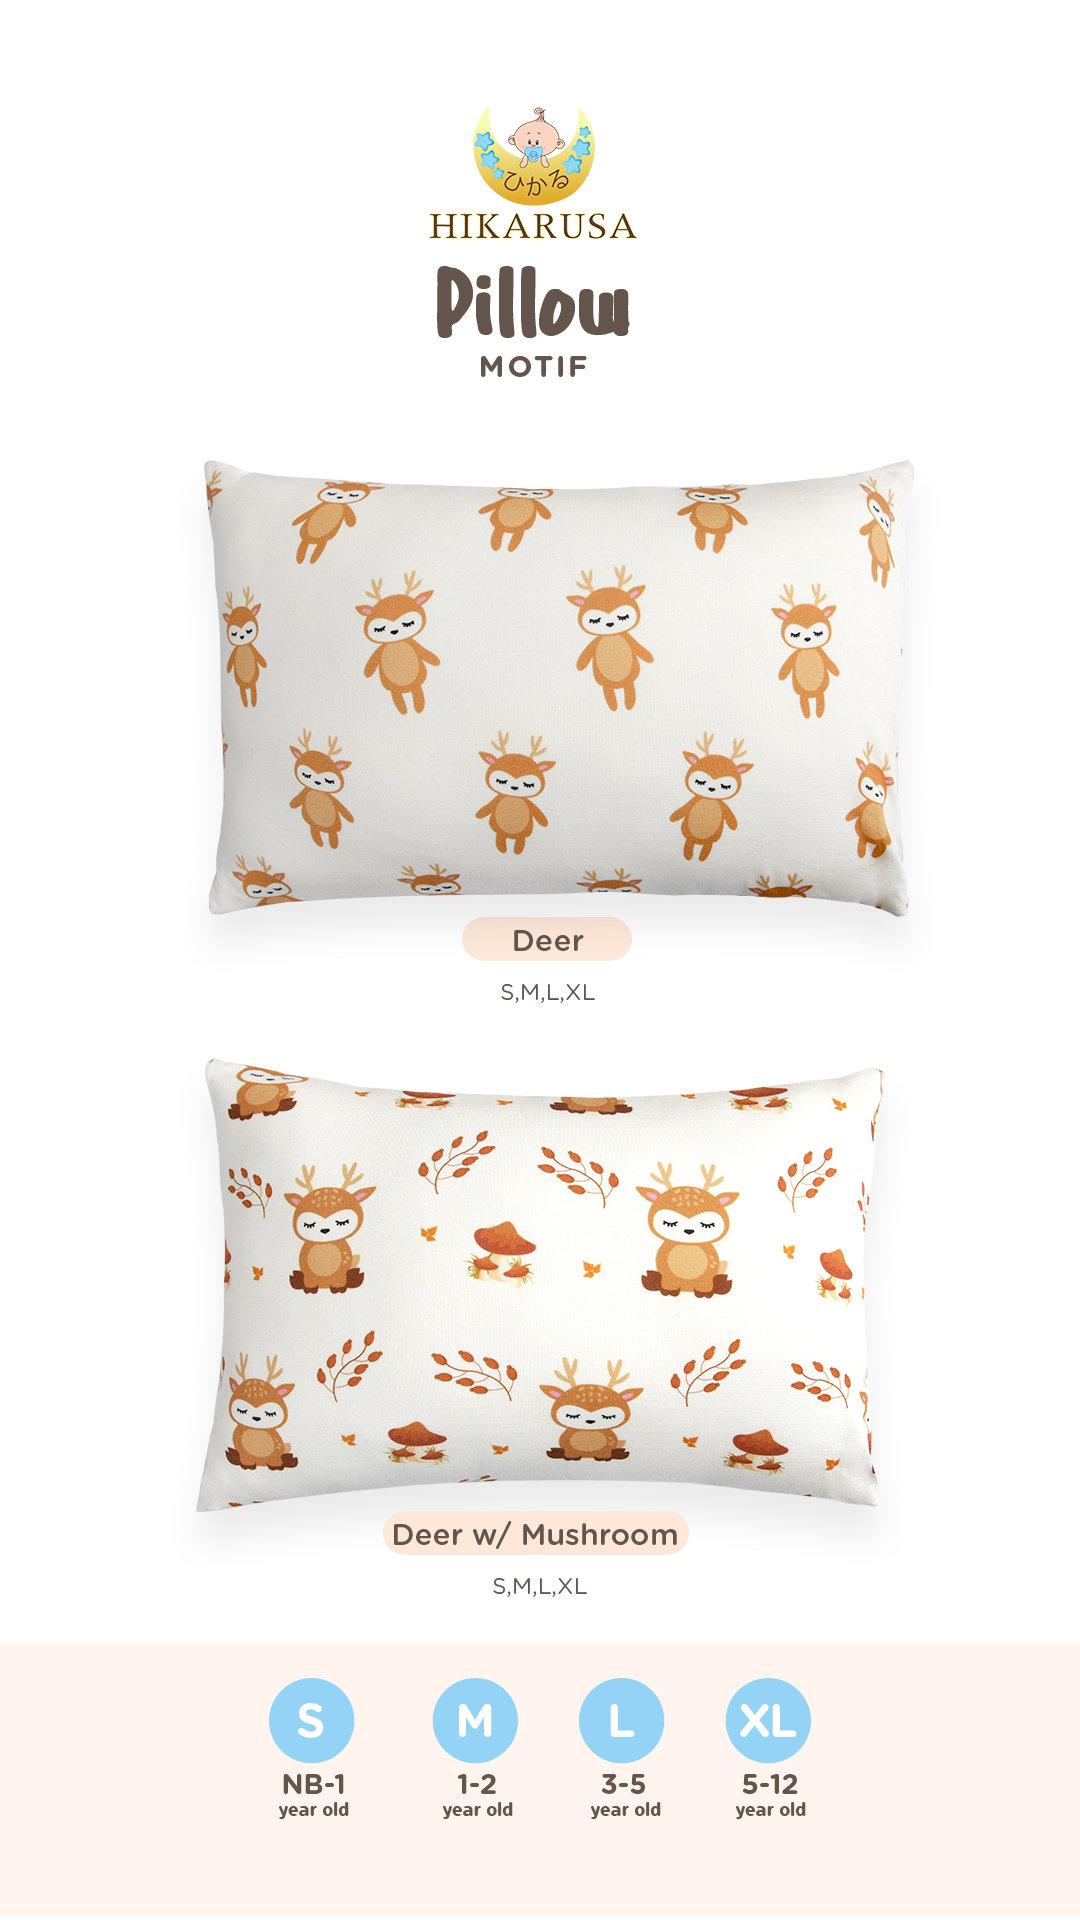 hikarusa pillow